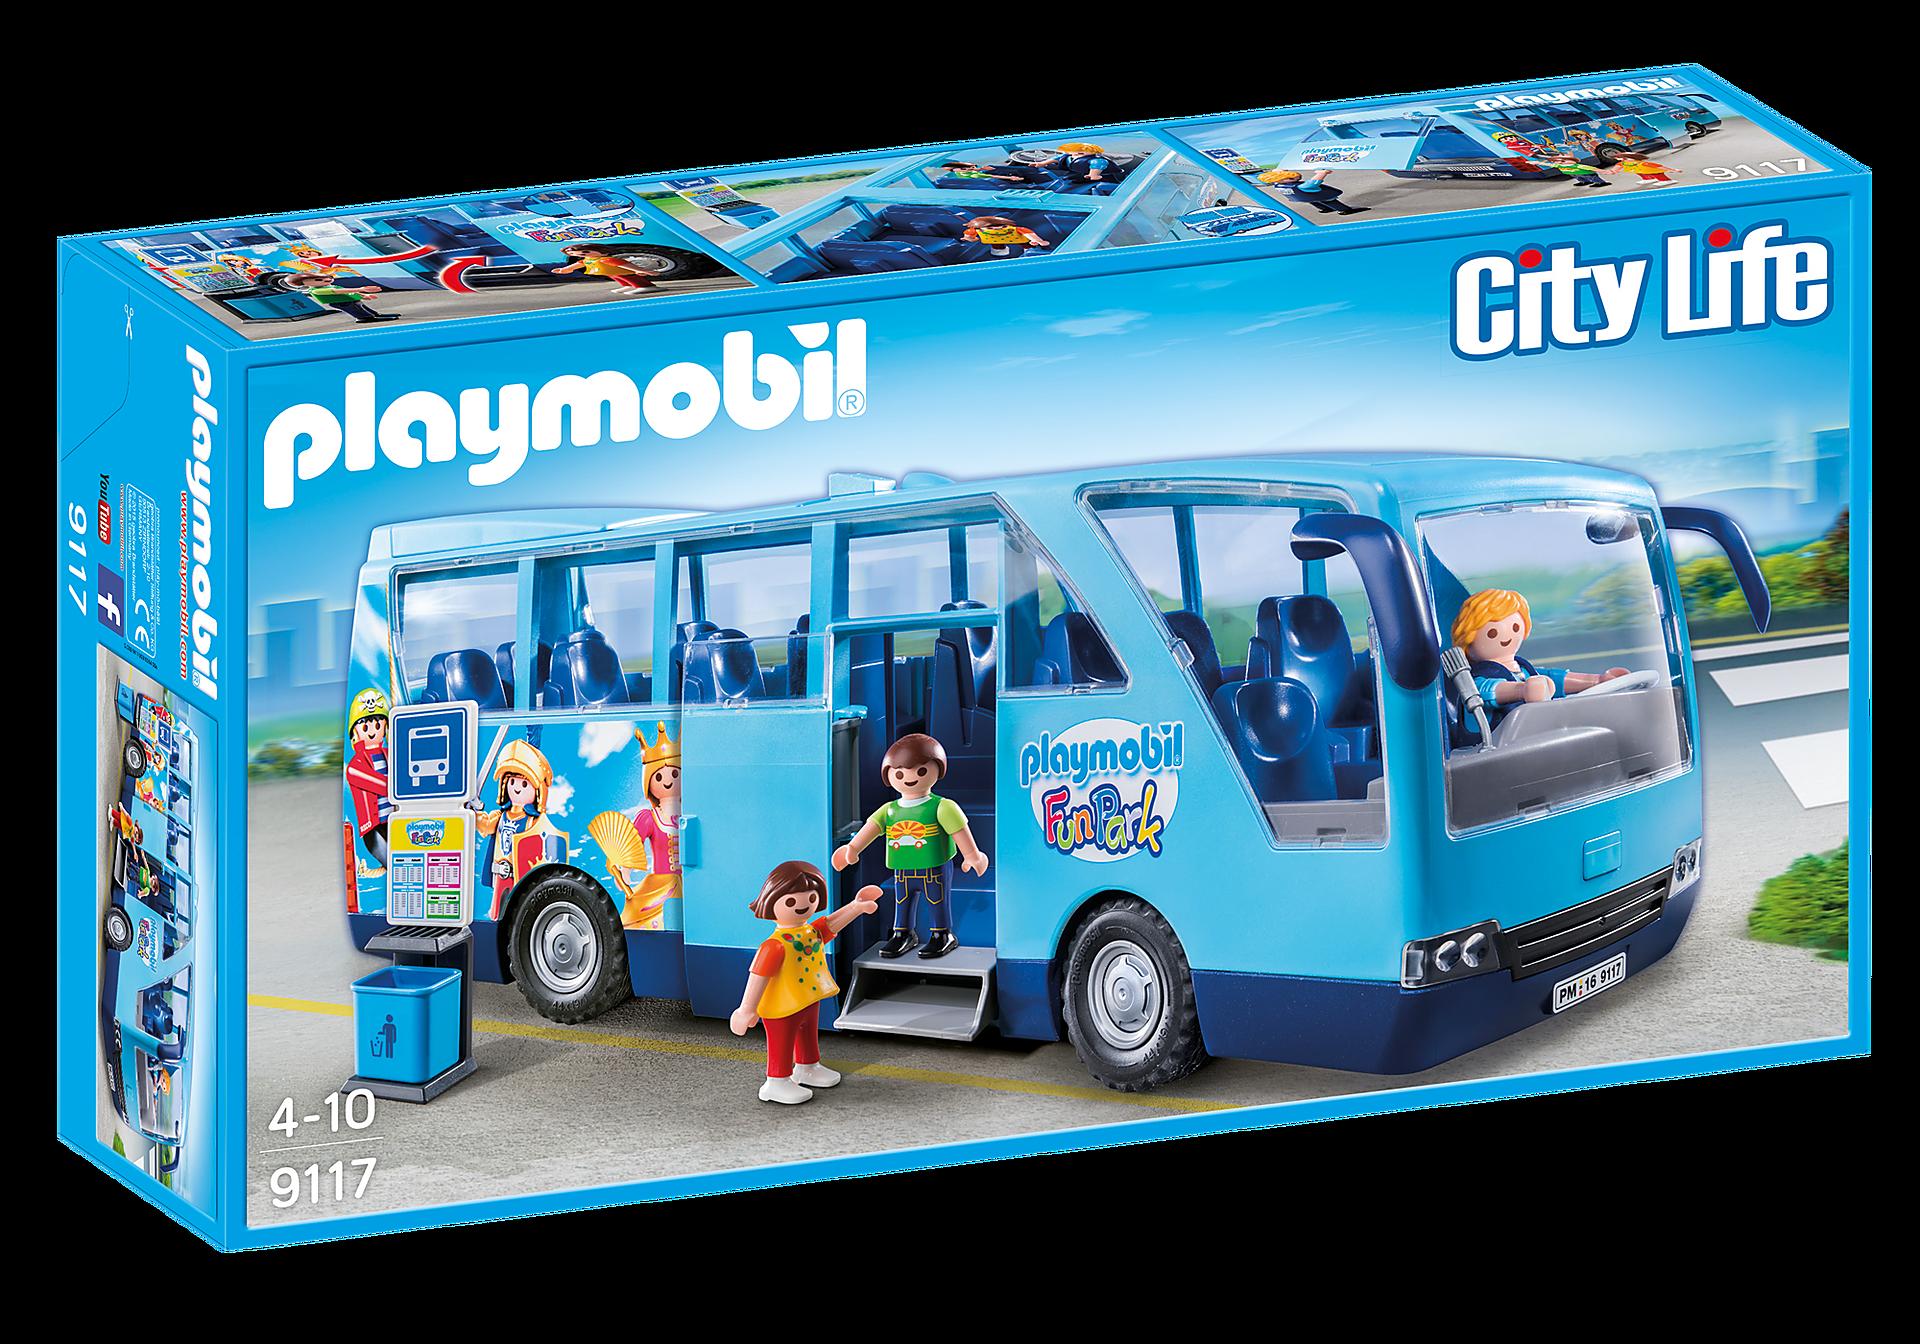 9117 PLAYMOBIL-FunPark skolebus zoom image2